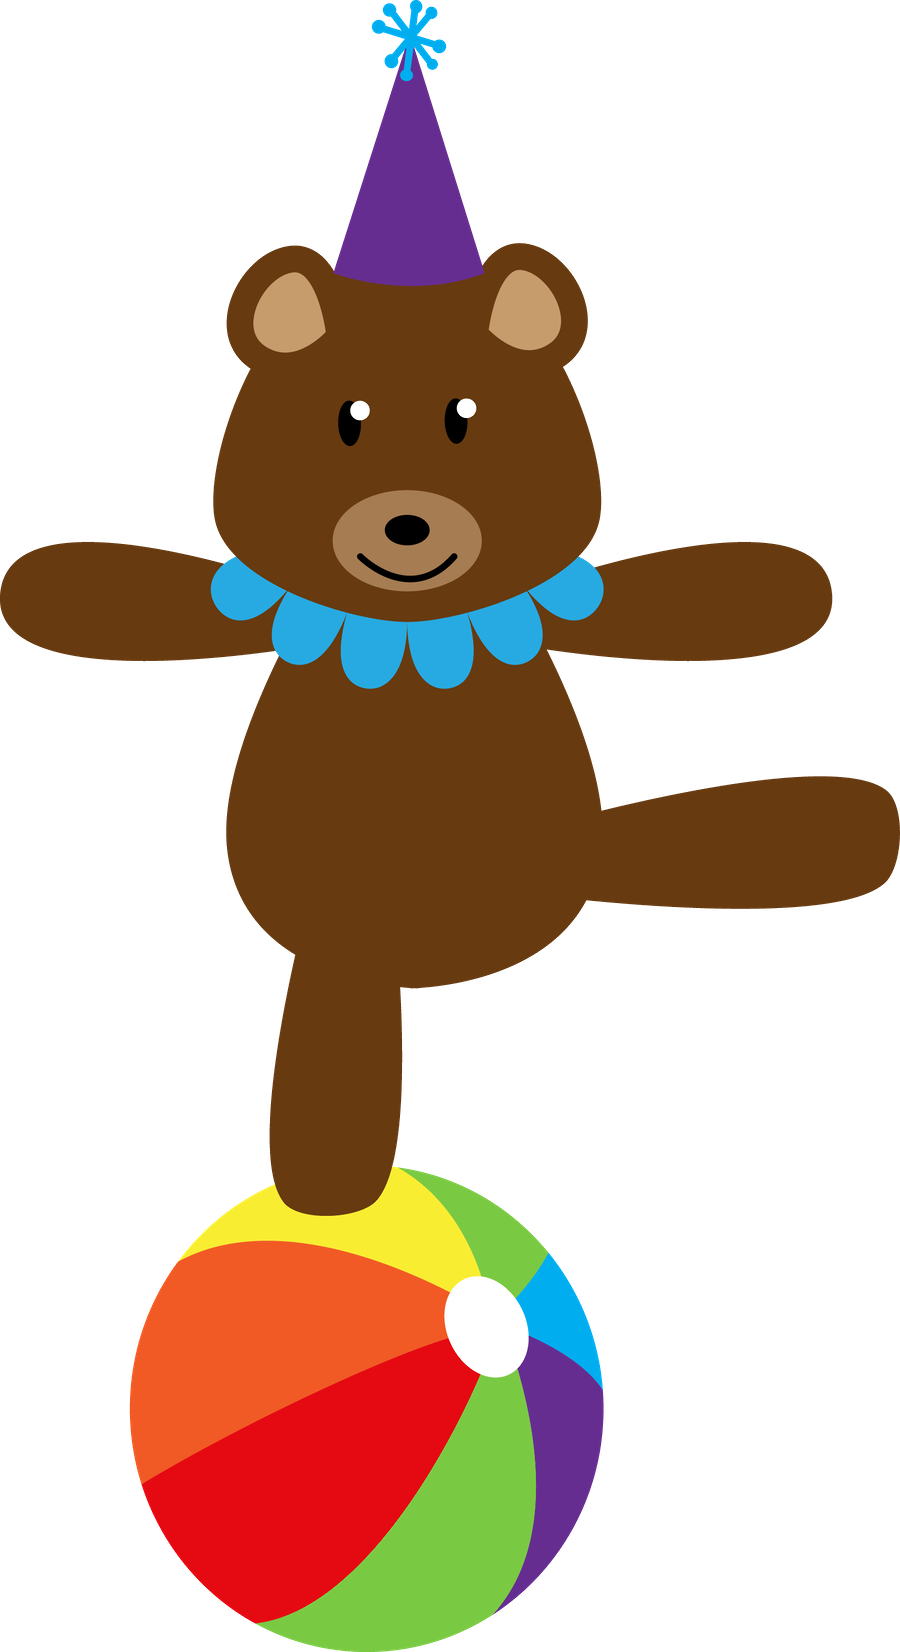 Grandpa clipart bear. Pin by melody bray